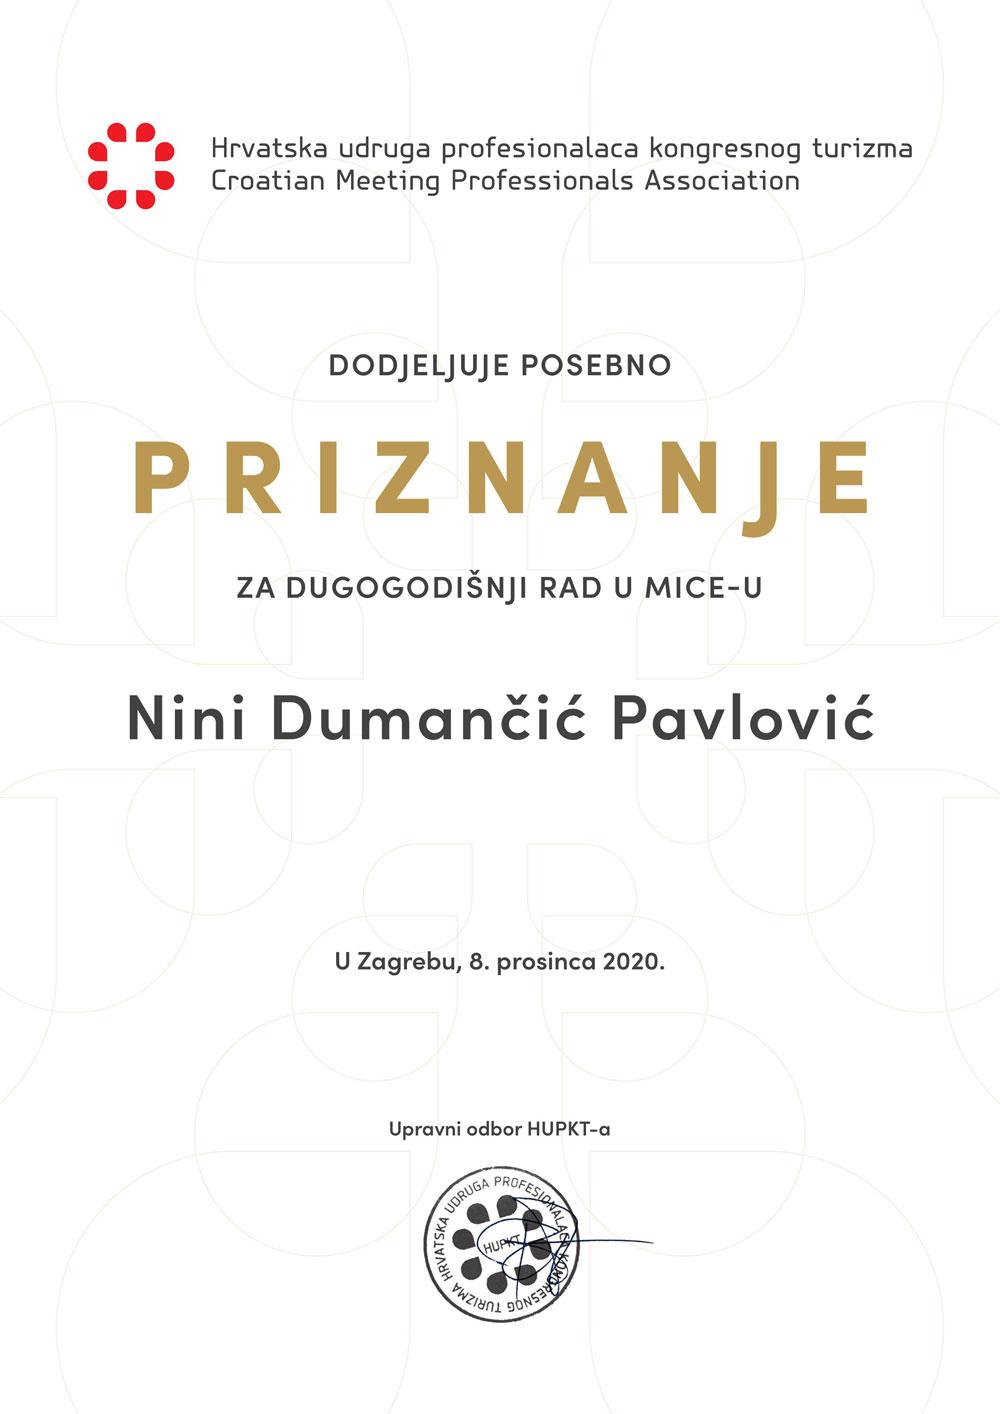 Nina Dumančić